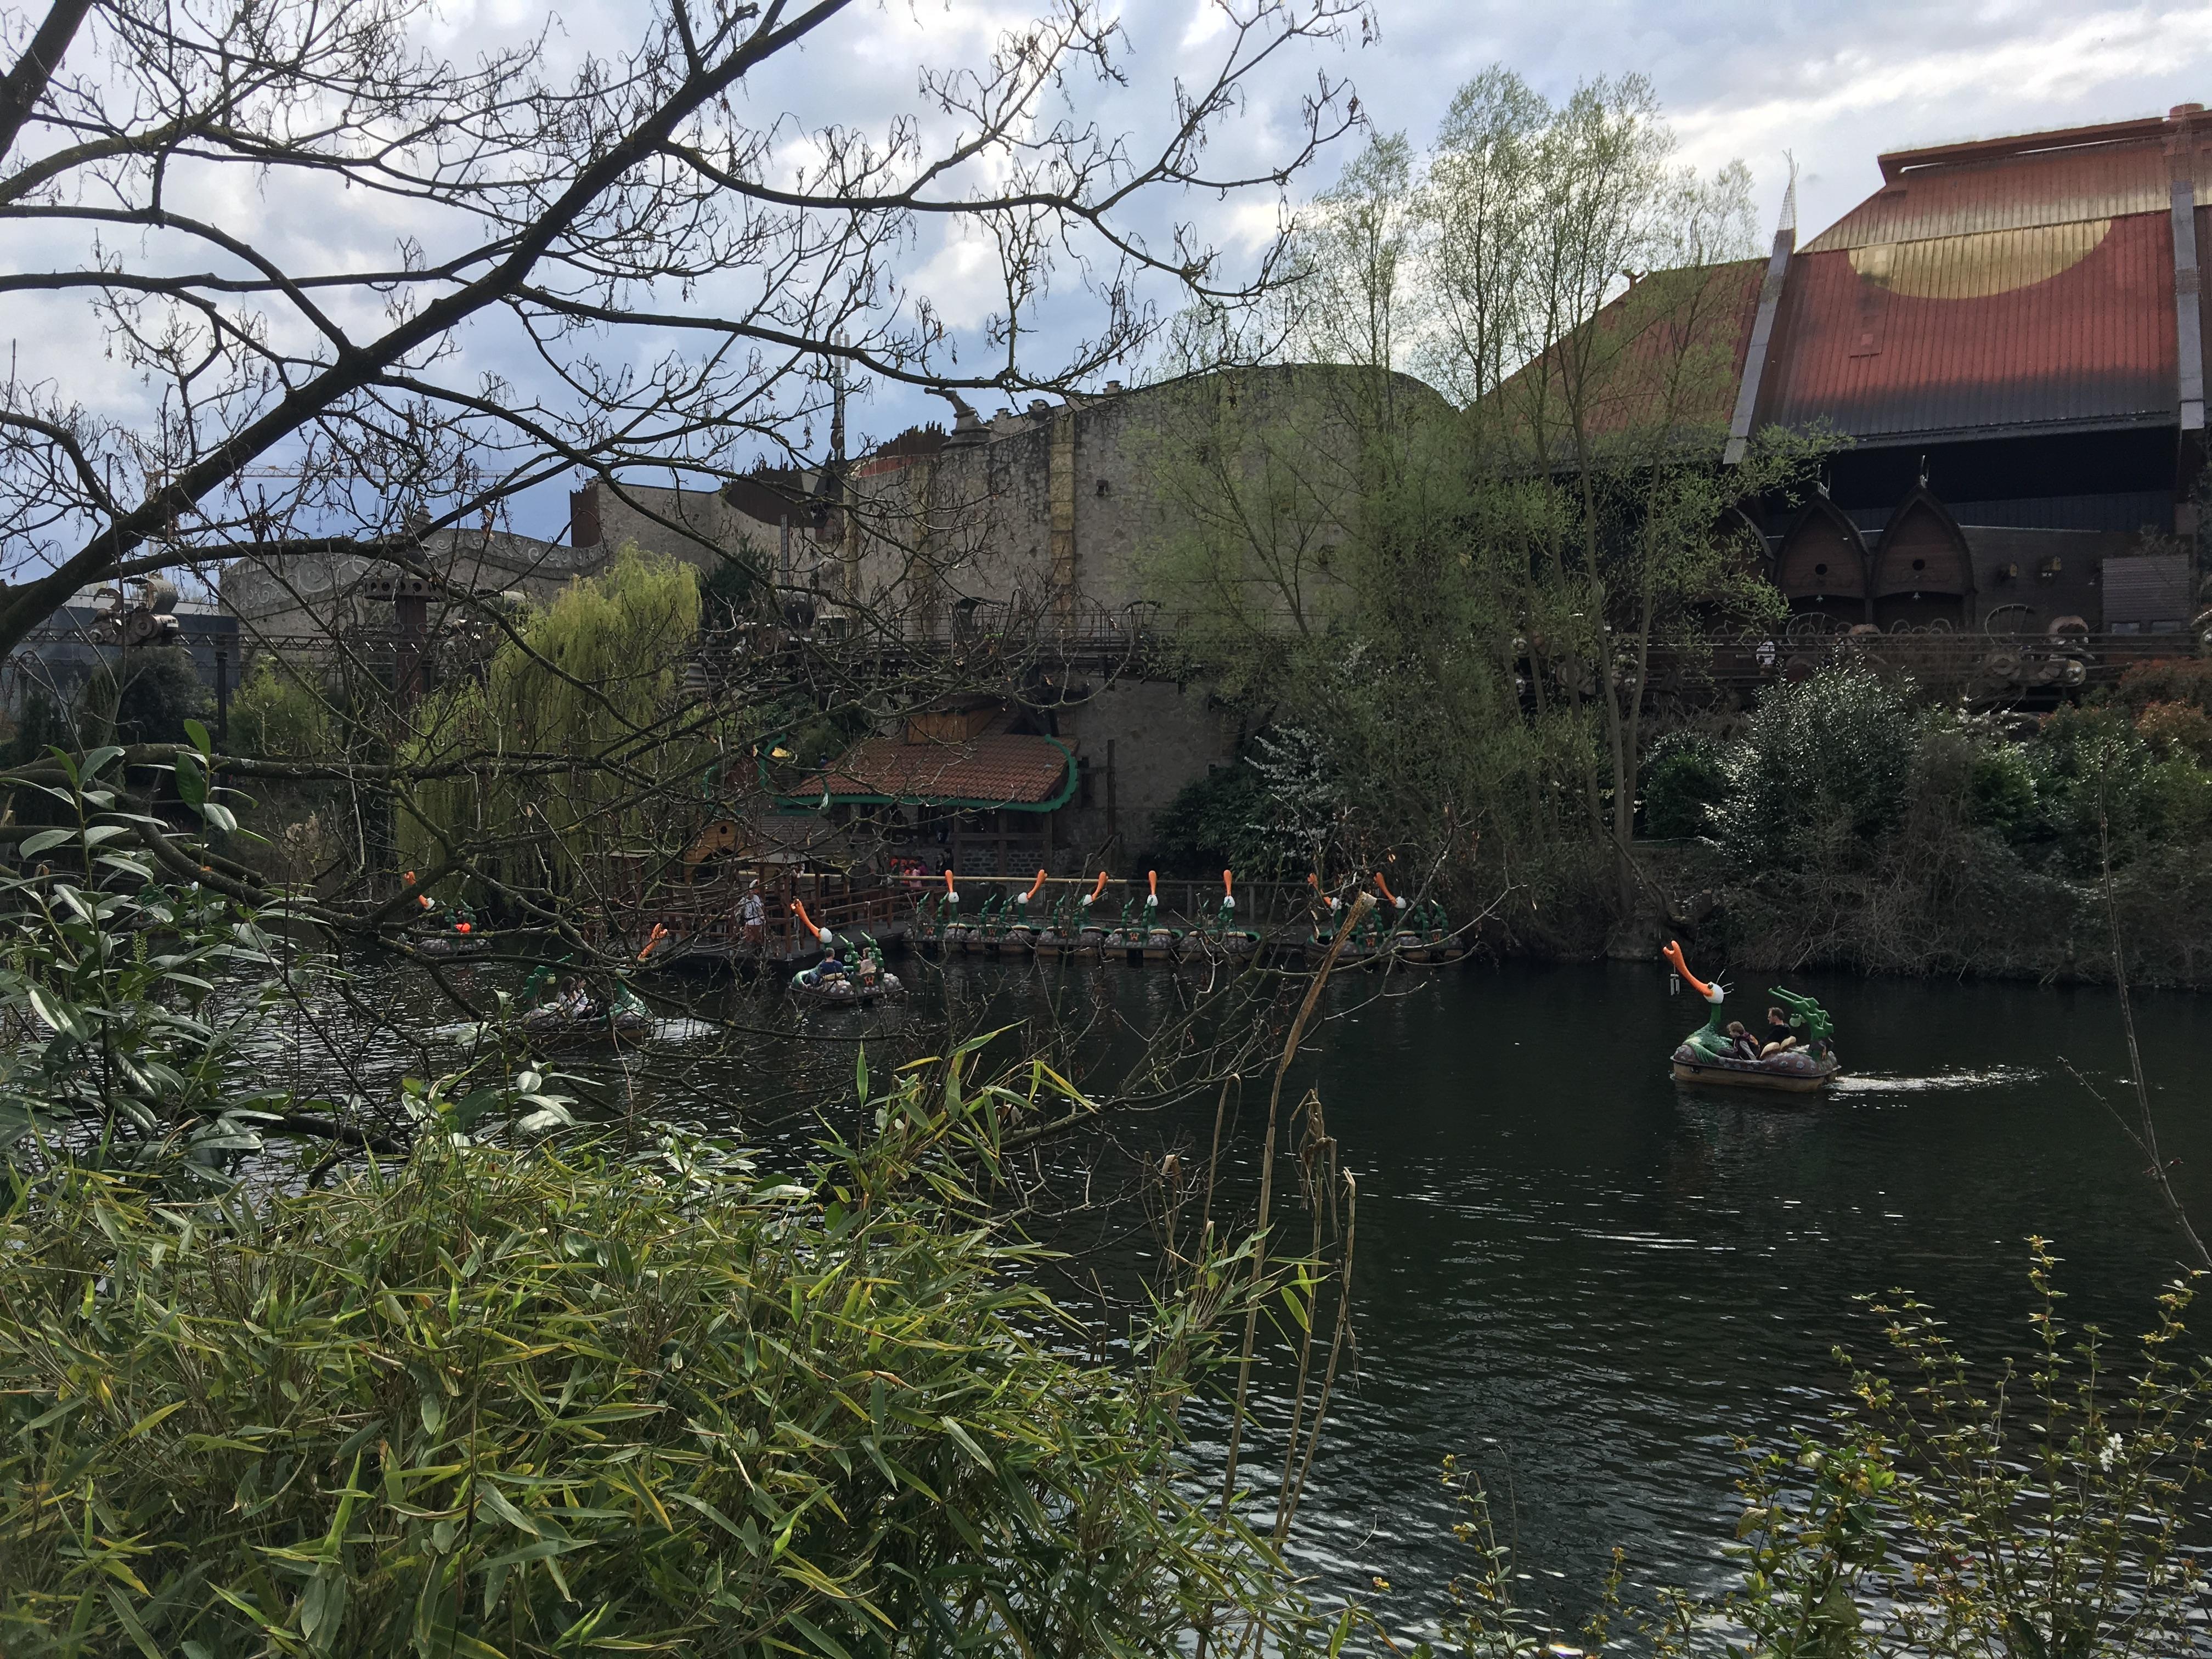 https://www.park-check.de/wp-content/uploads/2017/04/IMG_6011.jpg